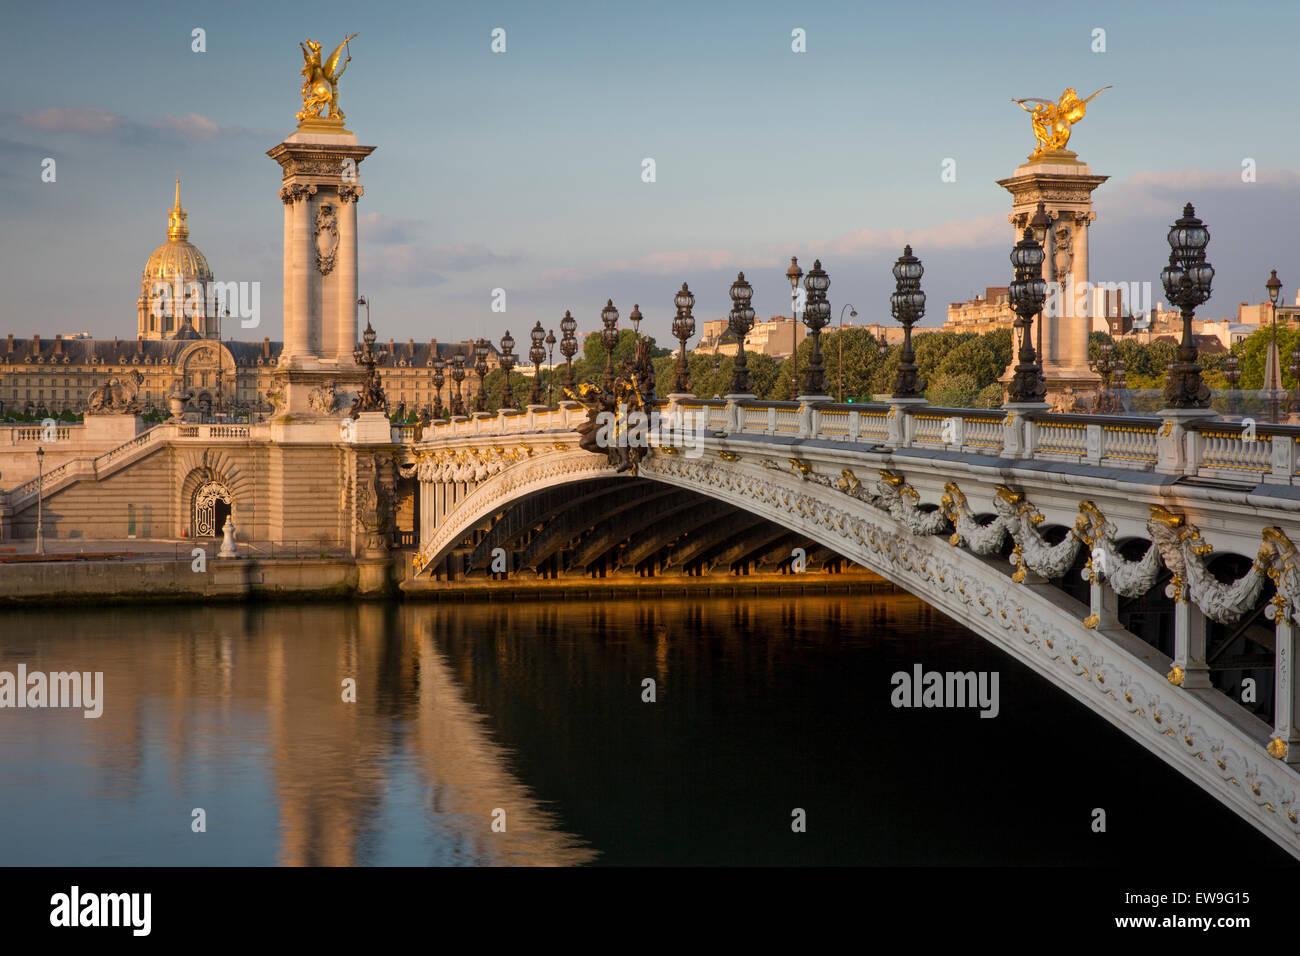 Alba sul Fiume Senna, Pont Alexandre III e Hotel a Les Invalides, Parigi, Francia Immagini Stock